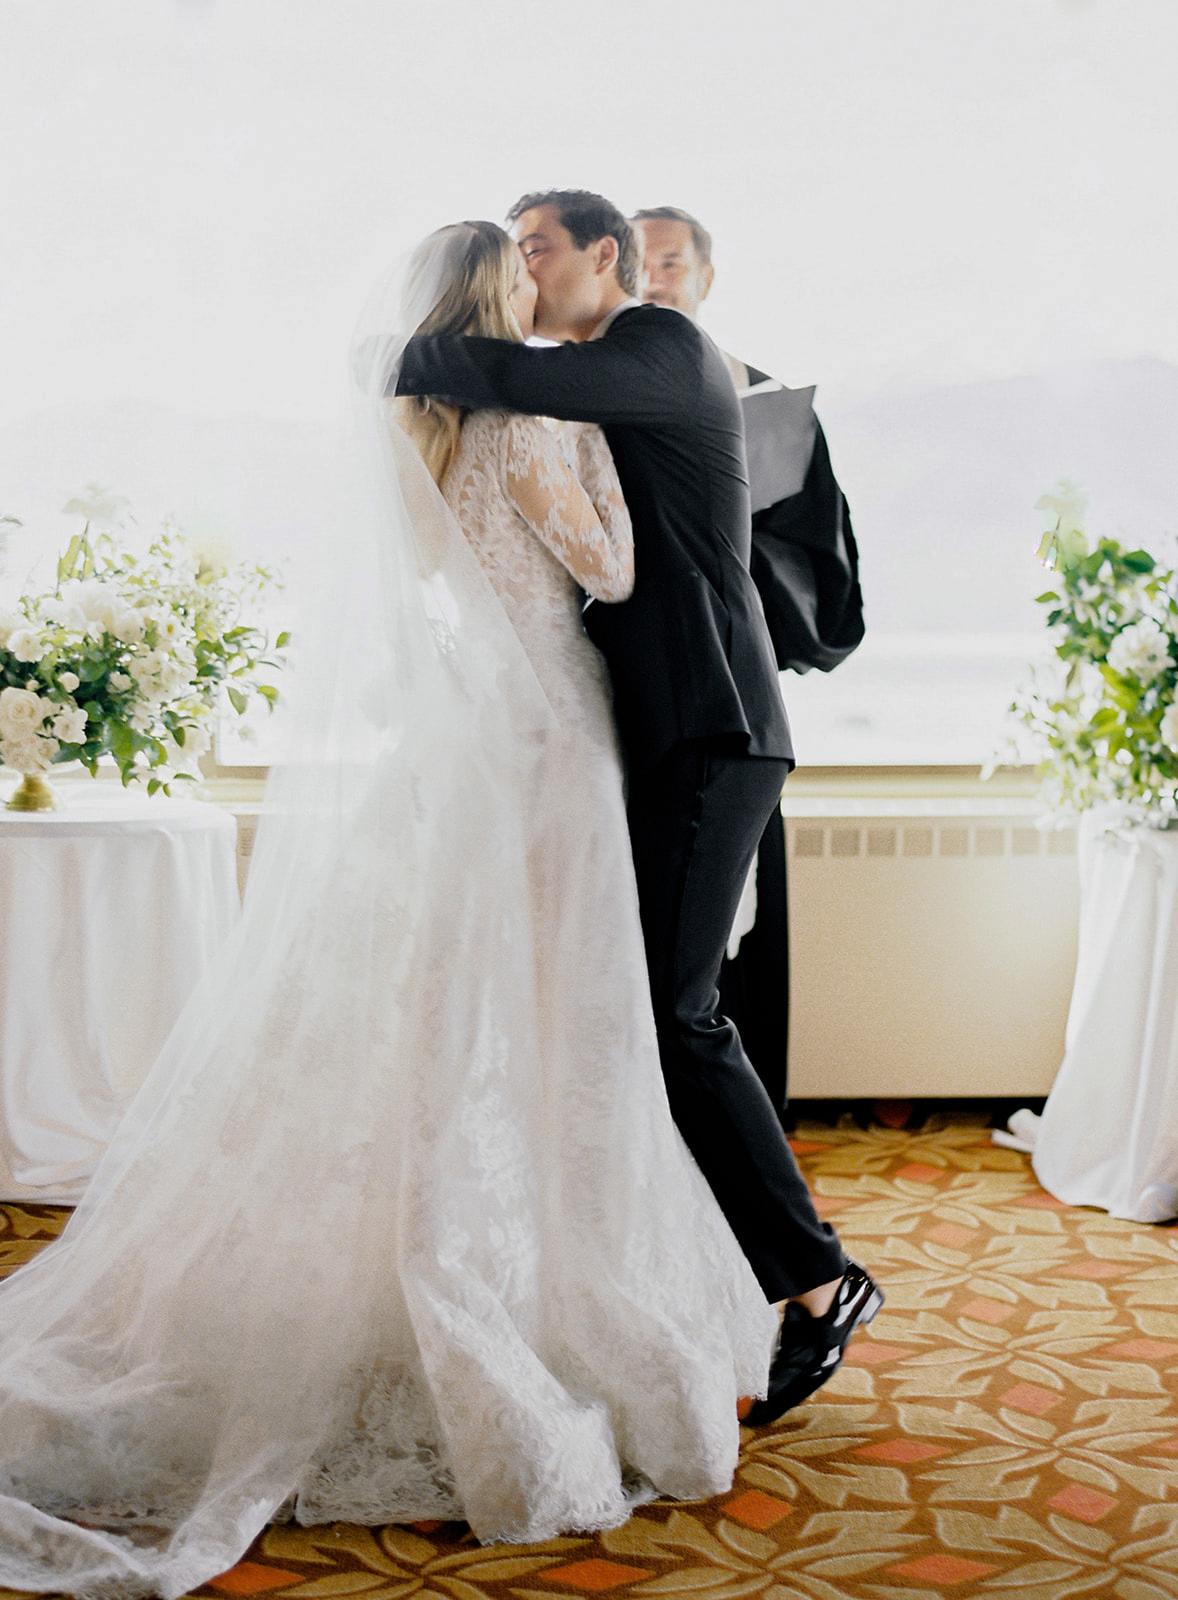 bride groom wedding reception first kiss